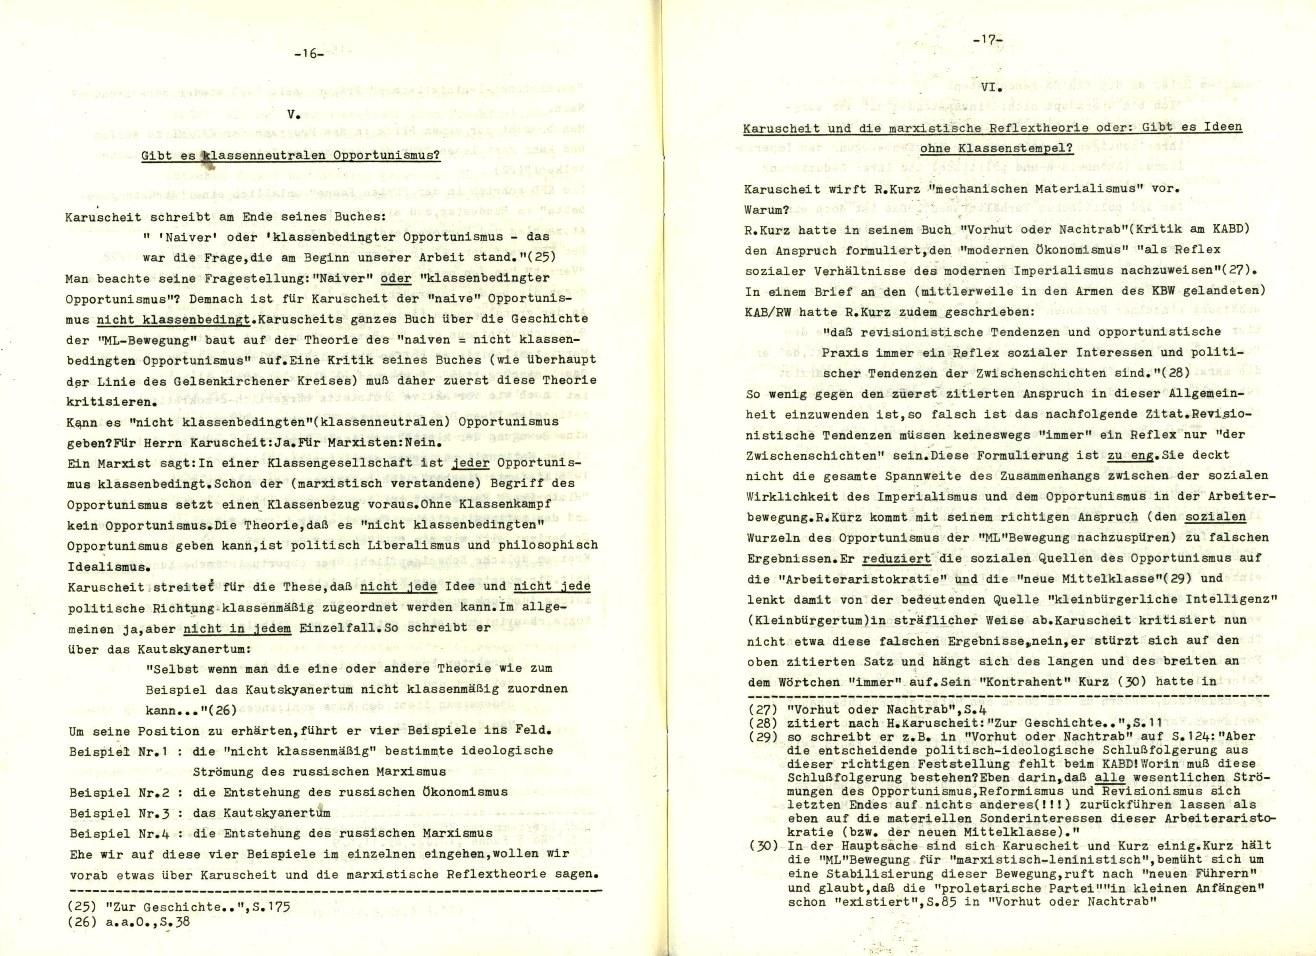 Muenchen_Kampf_dem_Revisionismus_1979_09_09